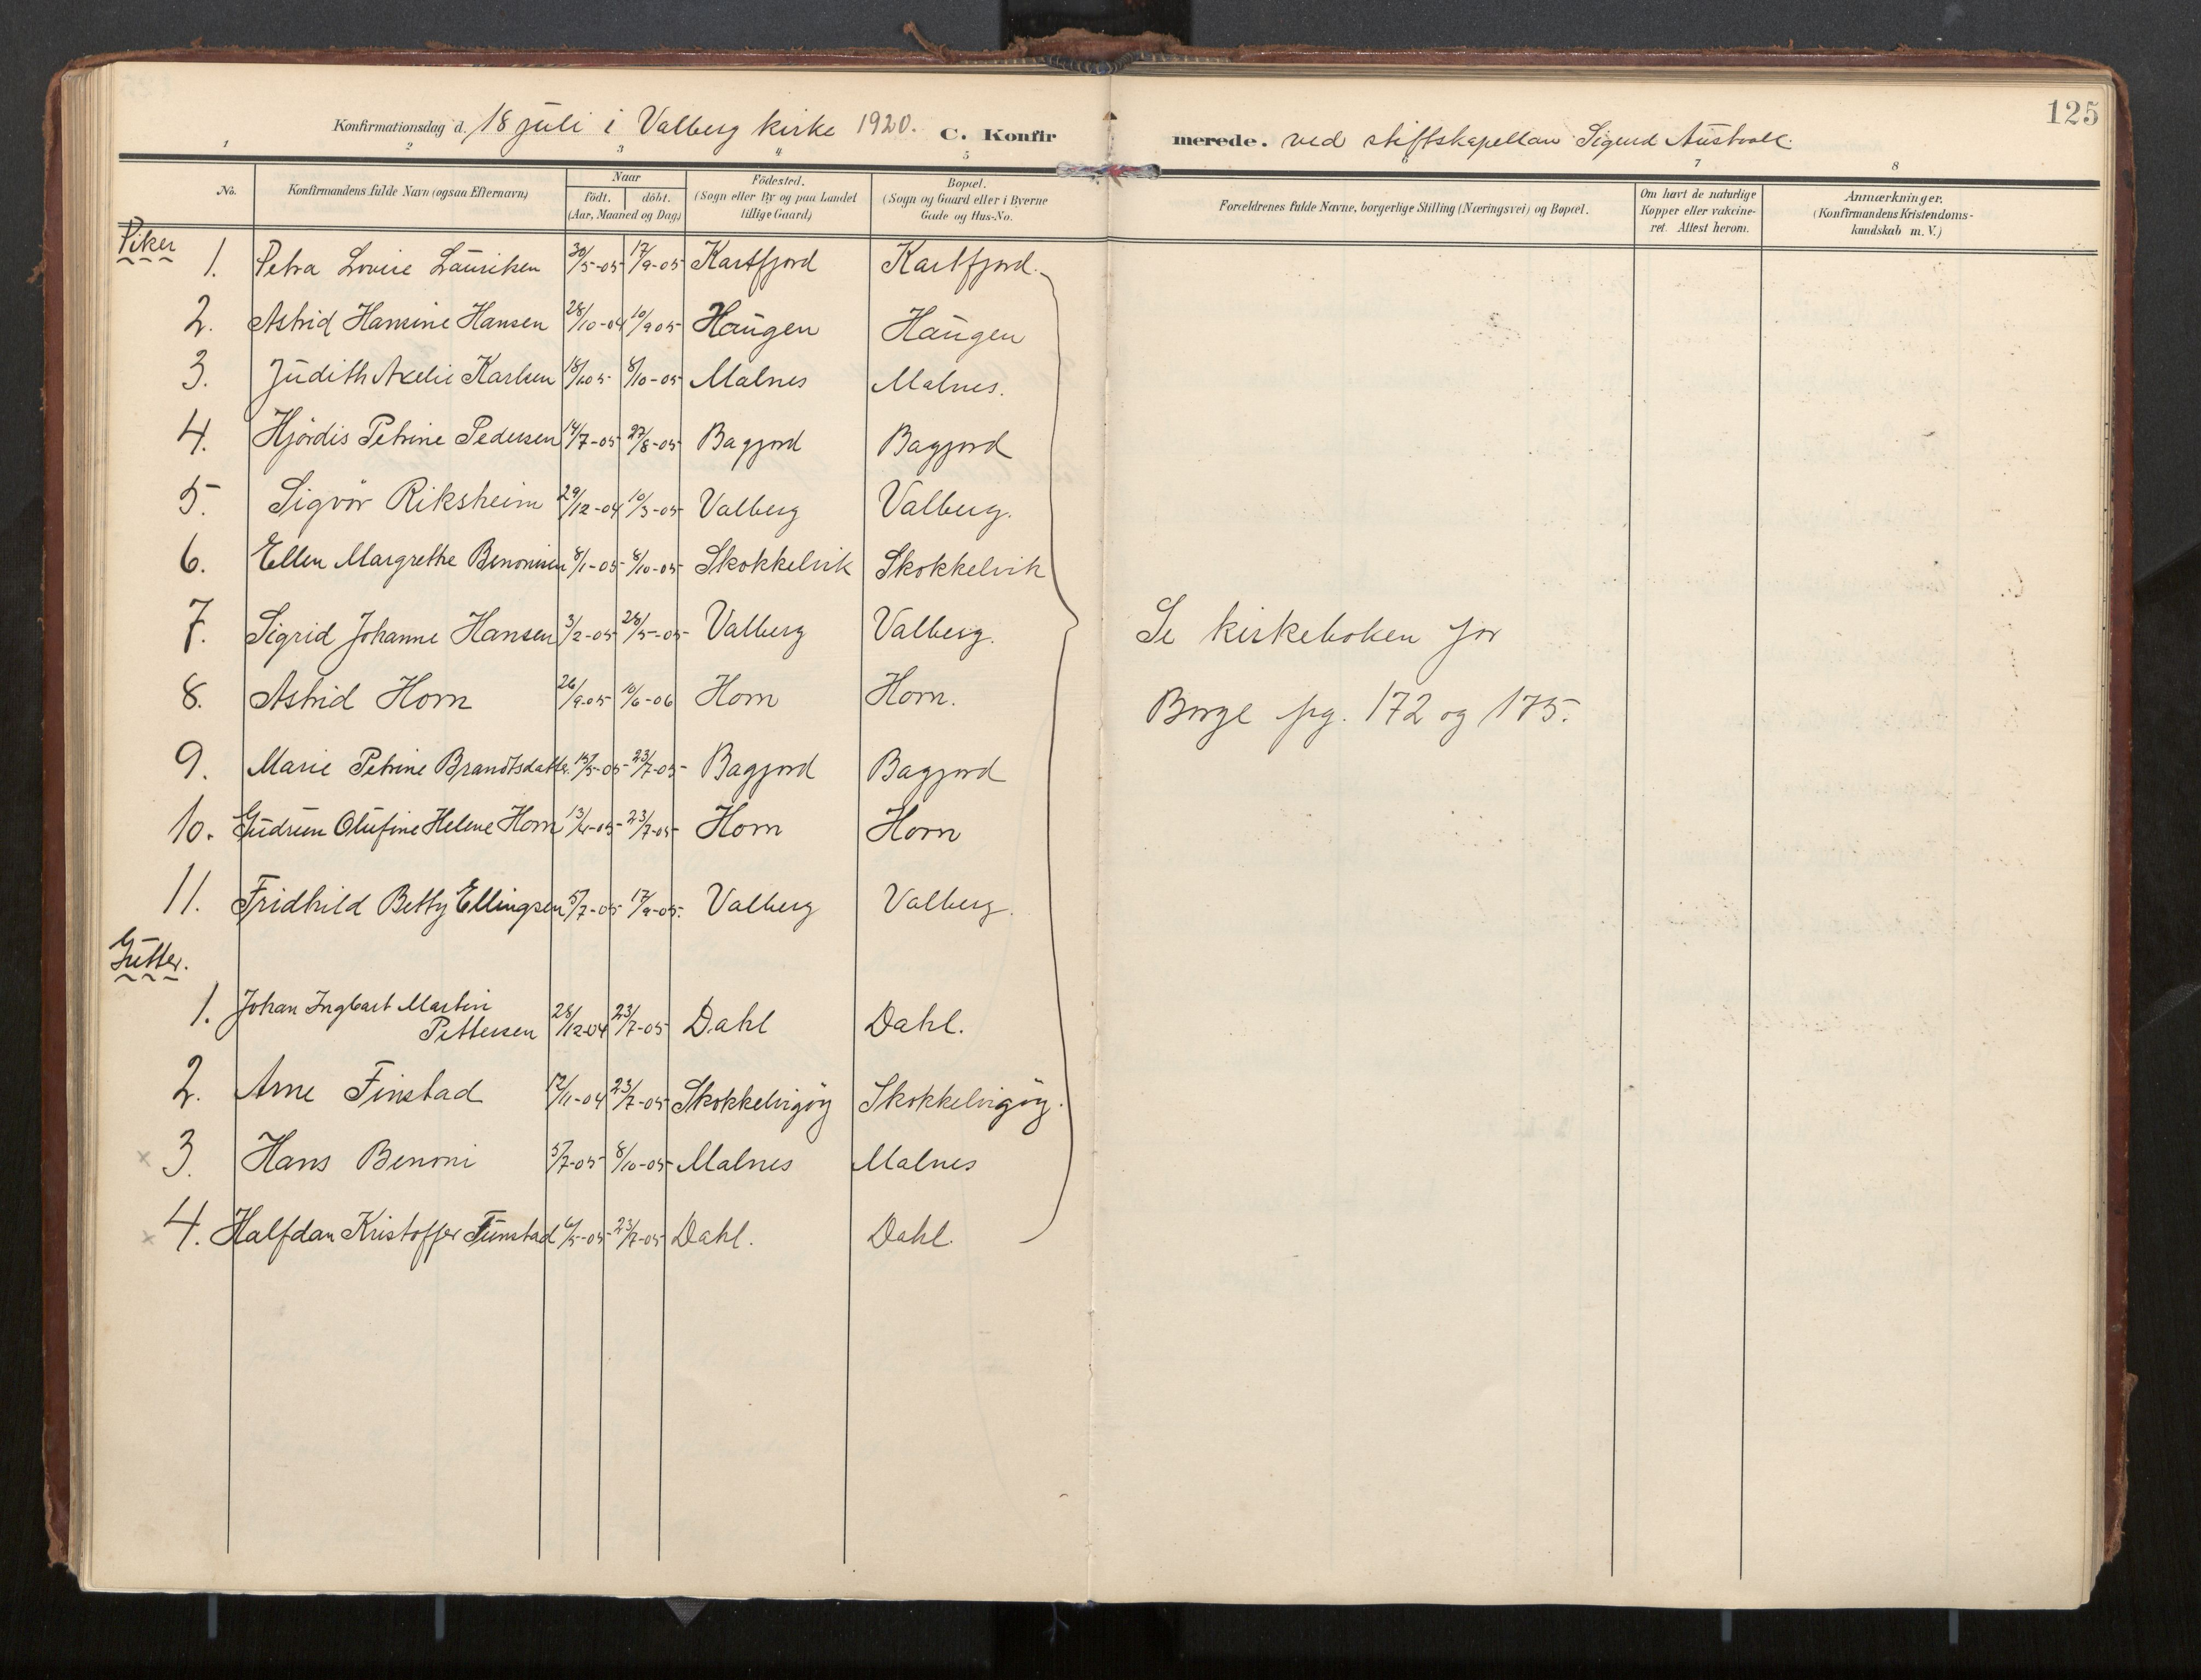 SAT, Ministerialprotokoller, klokkerbøker og fødselsregistre - Nordland, 884/L1194: Ministerialbok nr. 884A02, 1906-1937, s. 125